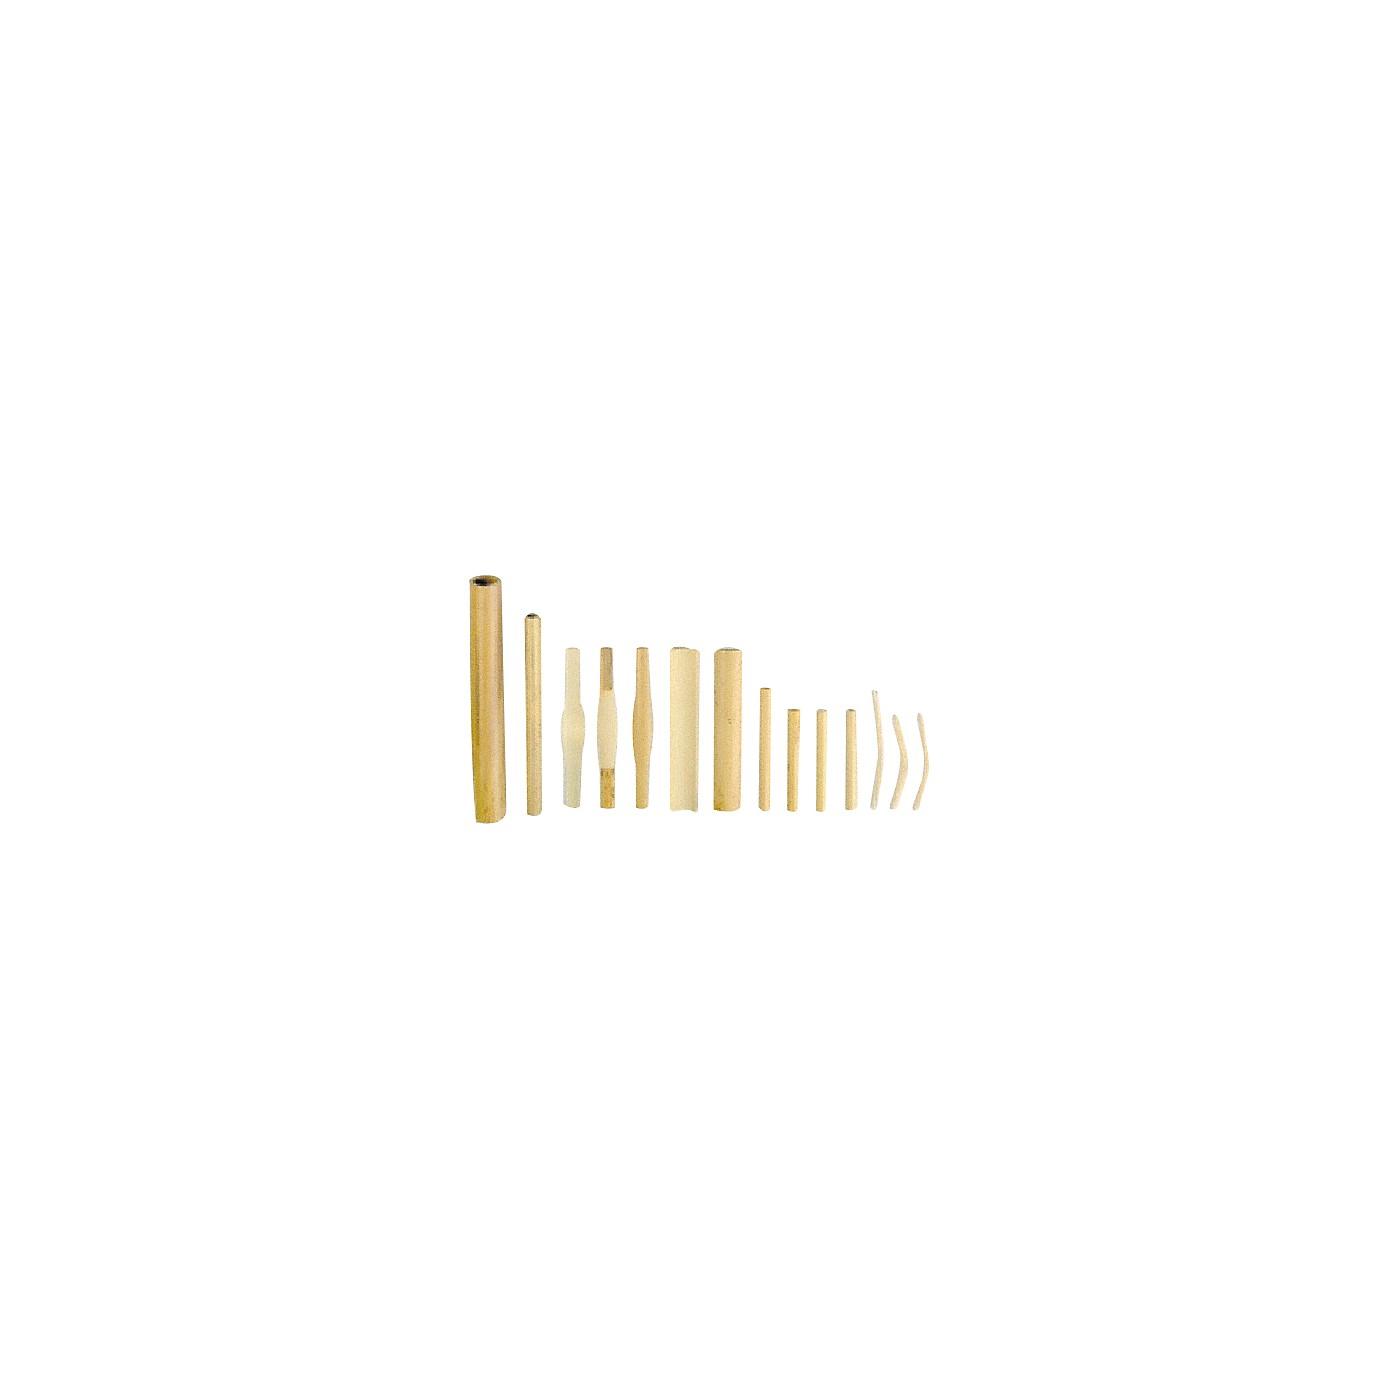 Vandoren Double Reed Cane thumbnail